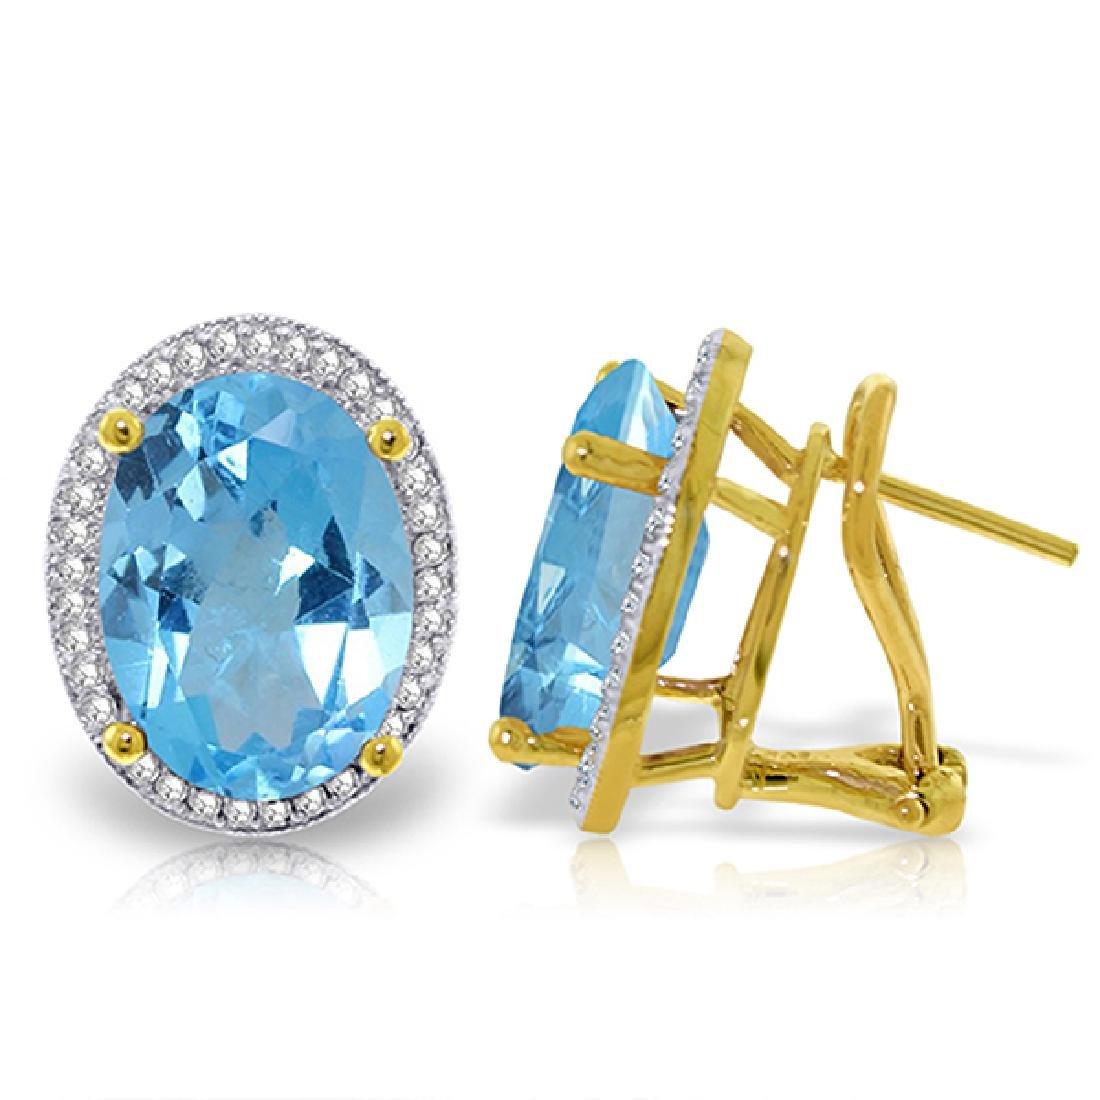 Genuine 15.16 ctw Blue Topaz & Diamond Earrings Jewelry